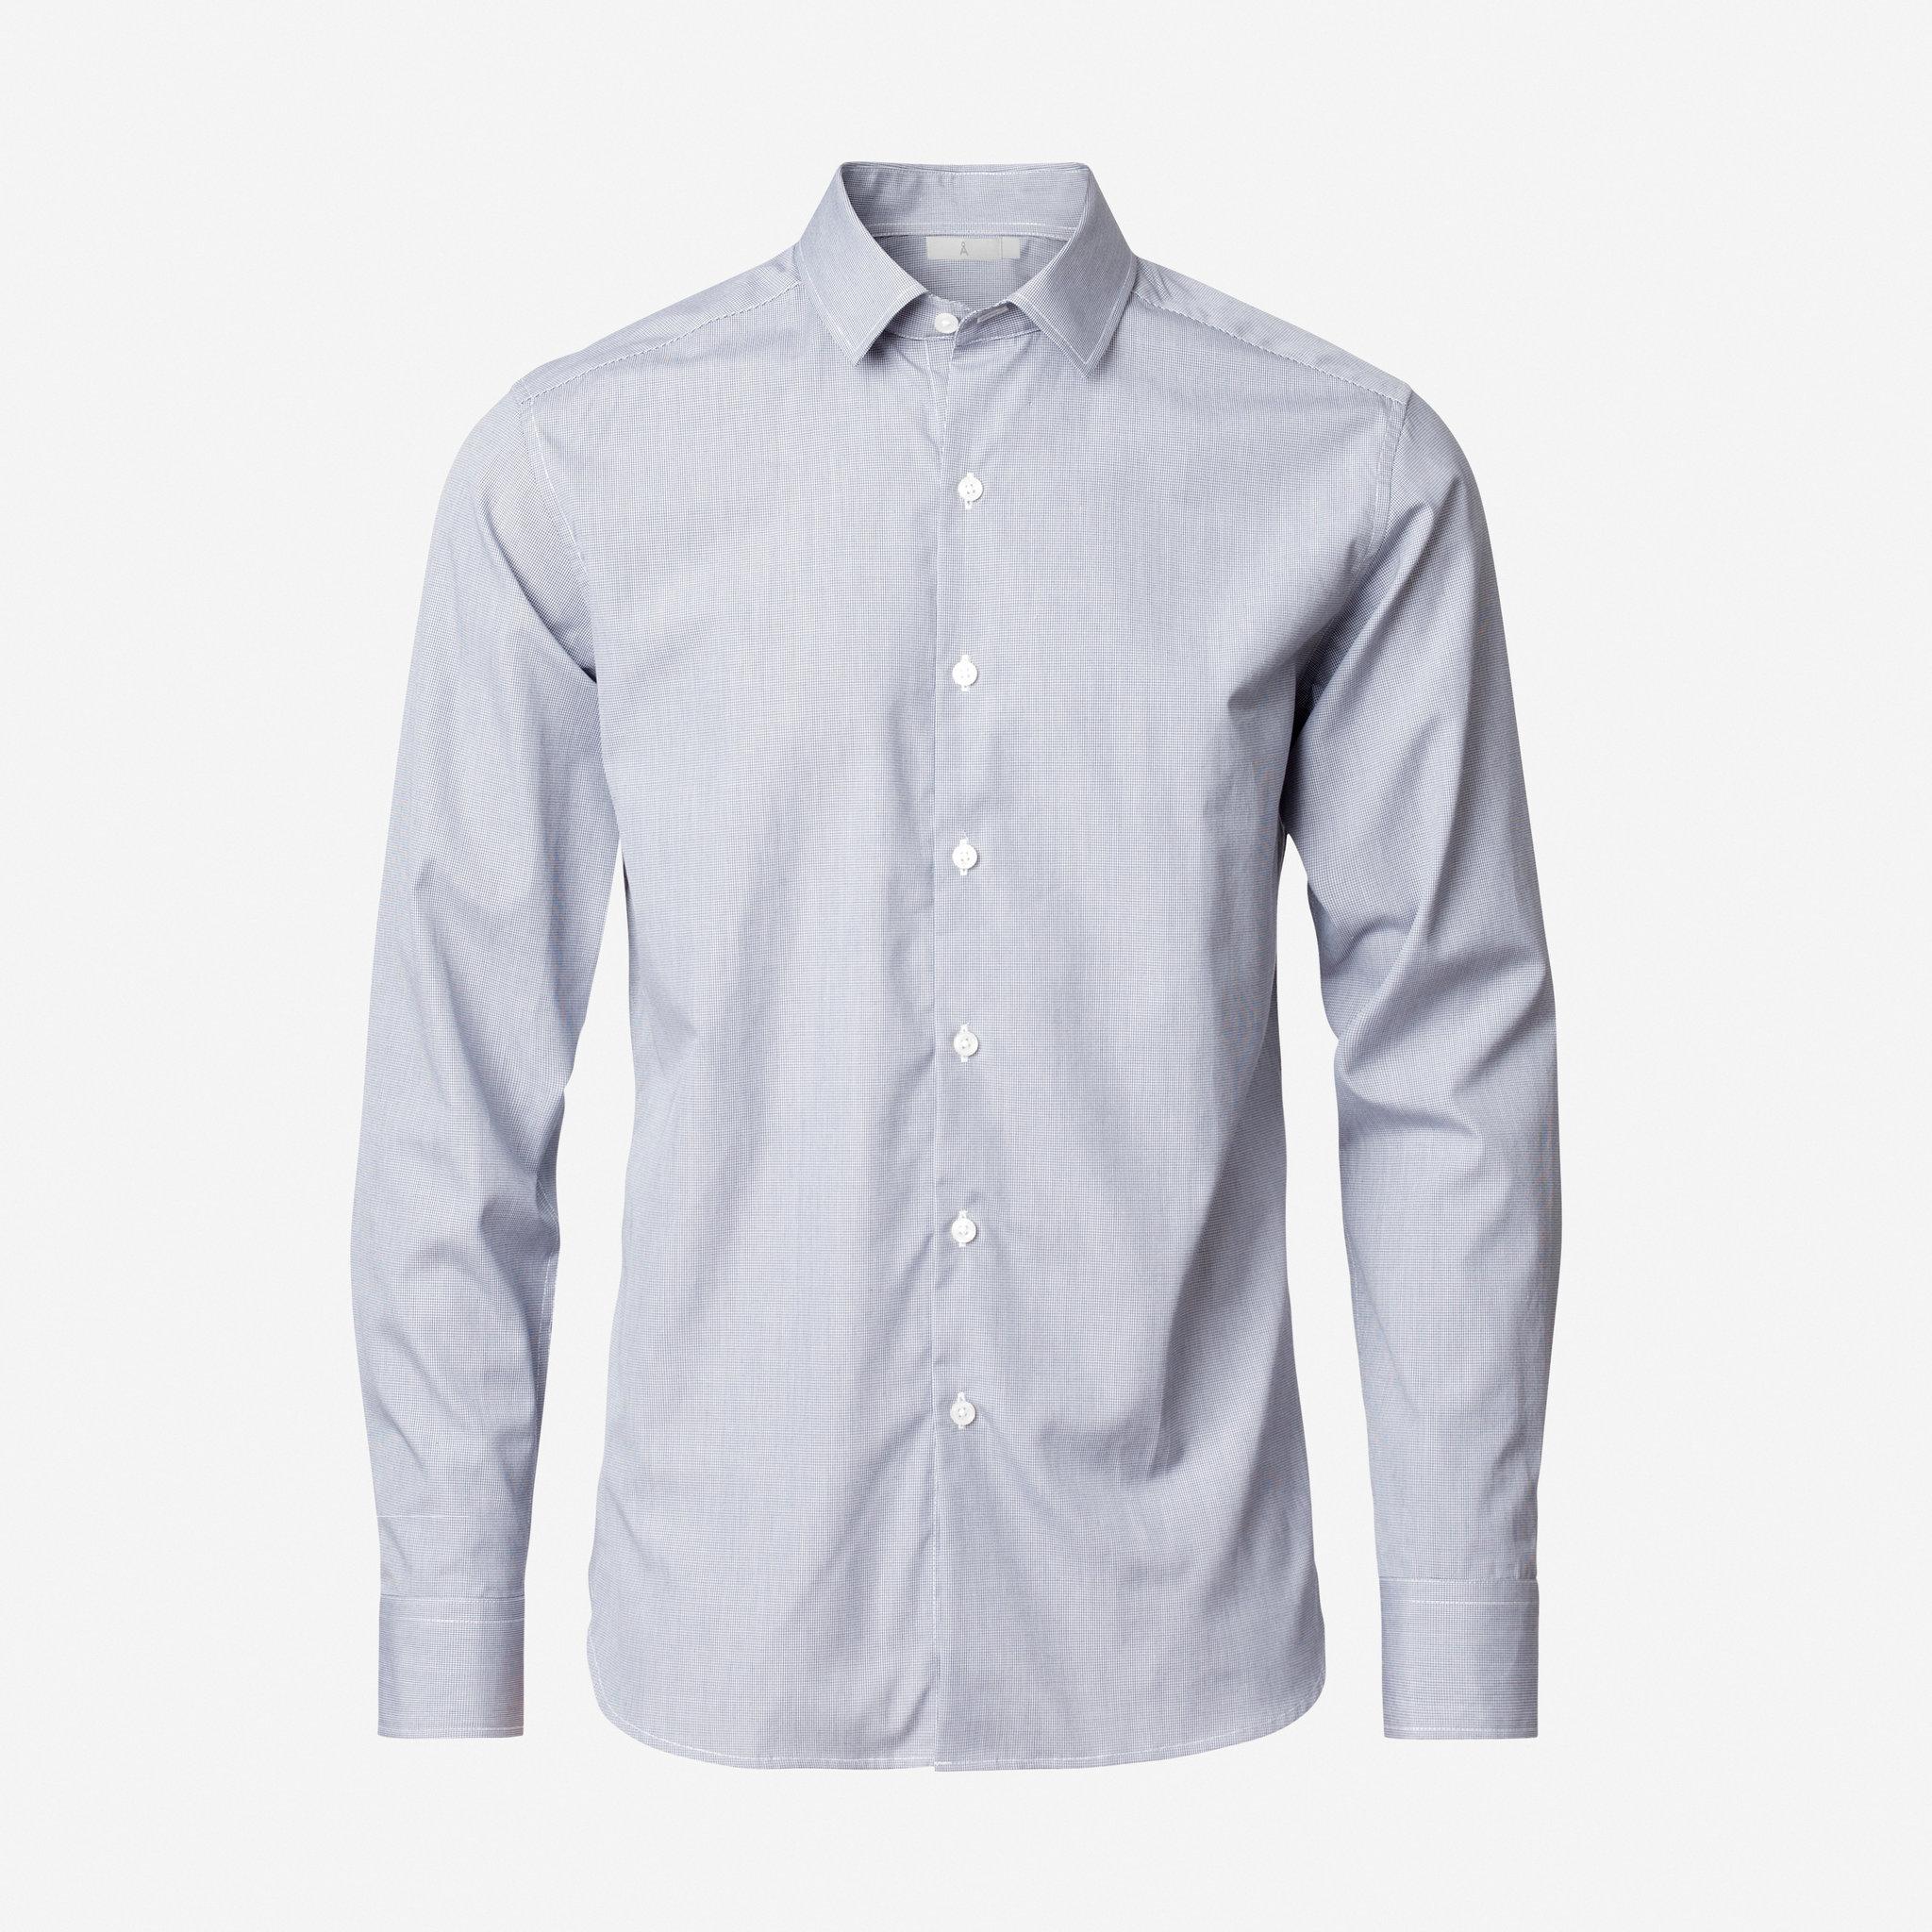 Skjorta med Slim Fit - Skjortor - Köp online på åhlens.se! aa499c6c00d2d